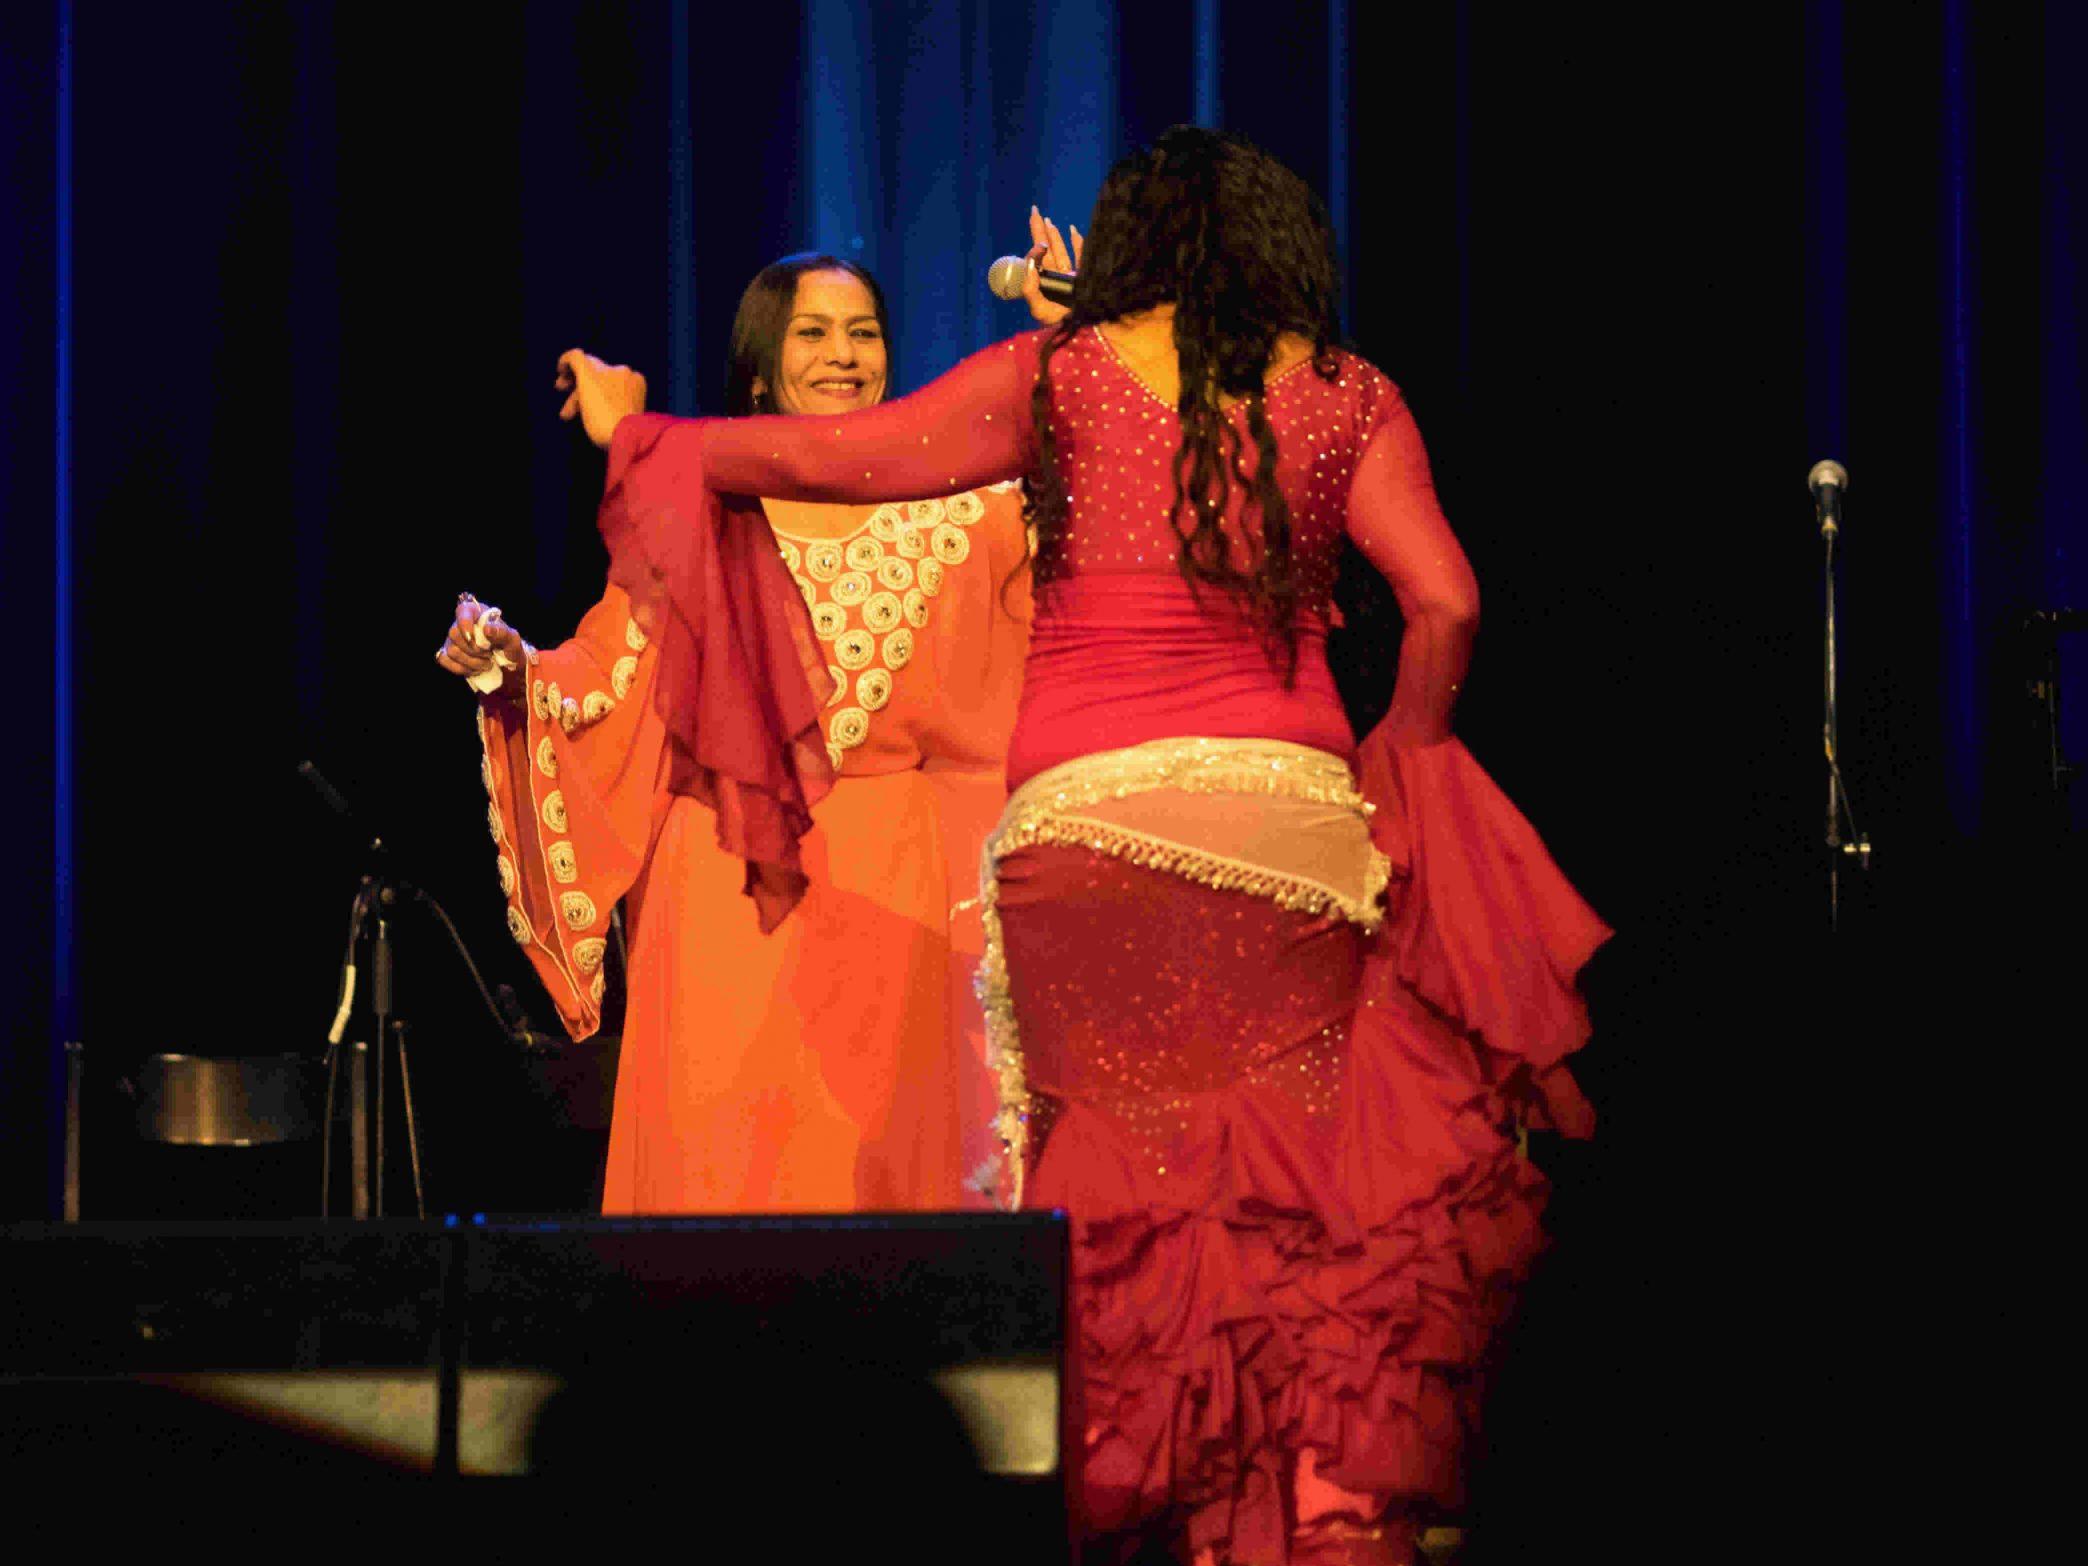 Gypsyfestival 2015 Sajeda 85